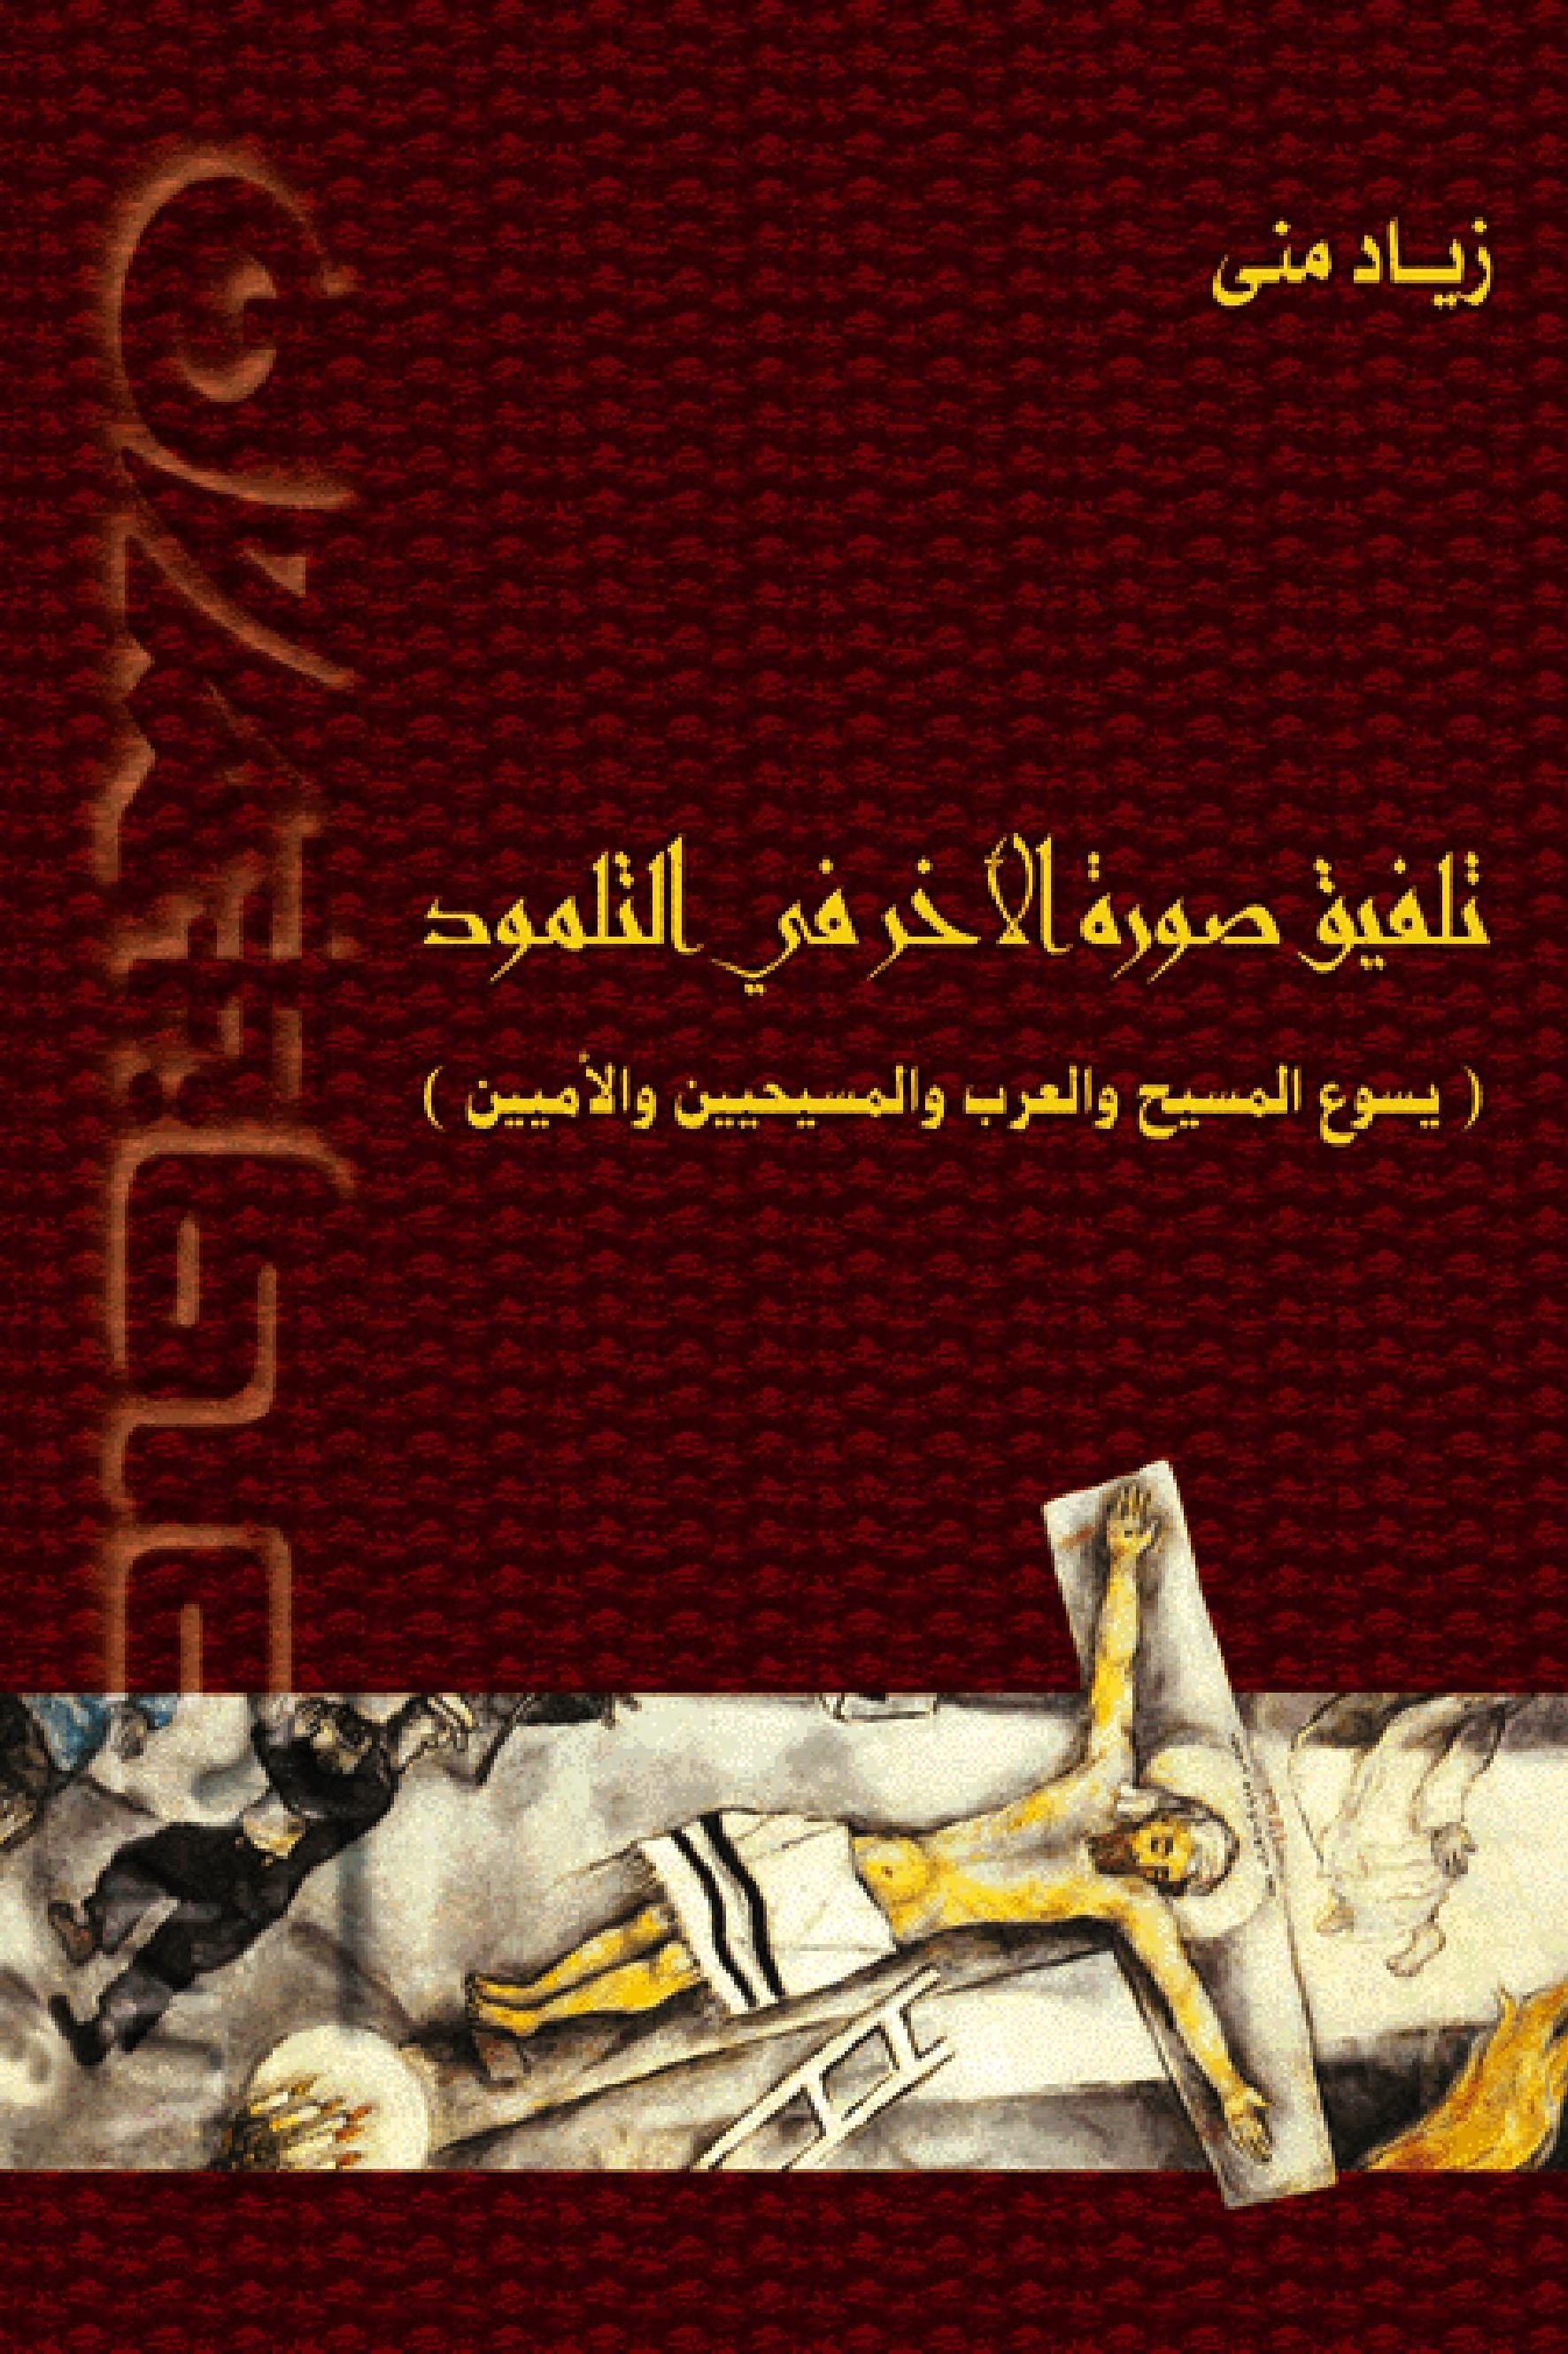 The Protocols Of The Eld Novel In Arabic رواية بروتوكولات حكماء صهيون بالعربية Novels Online Eld